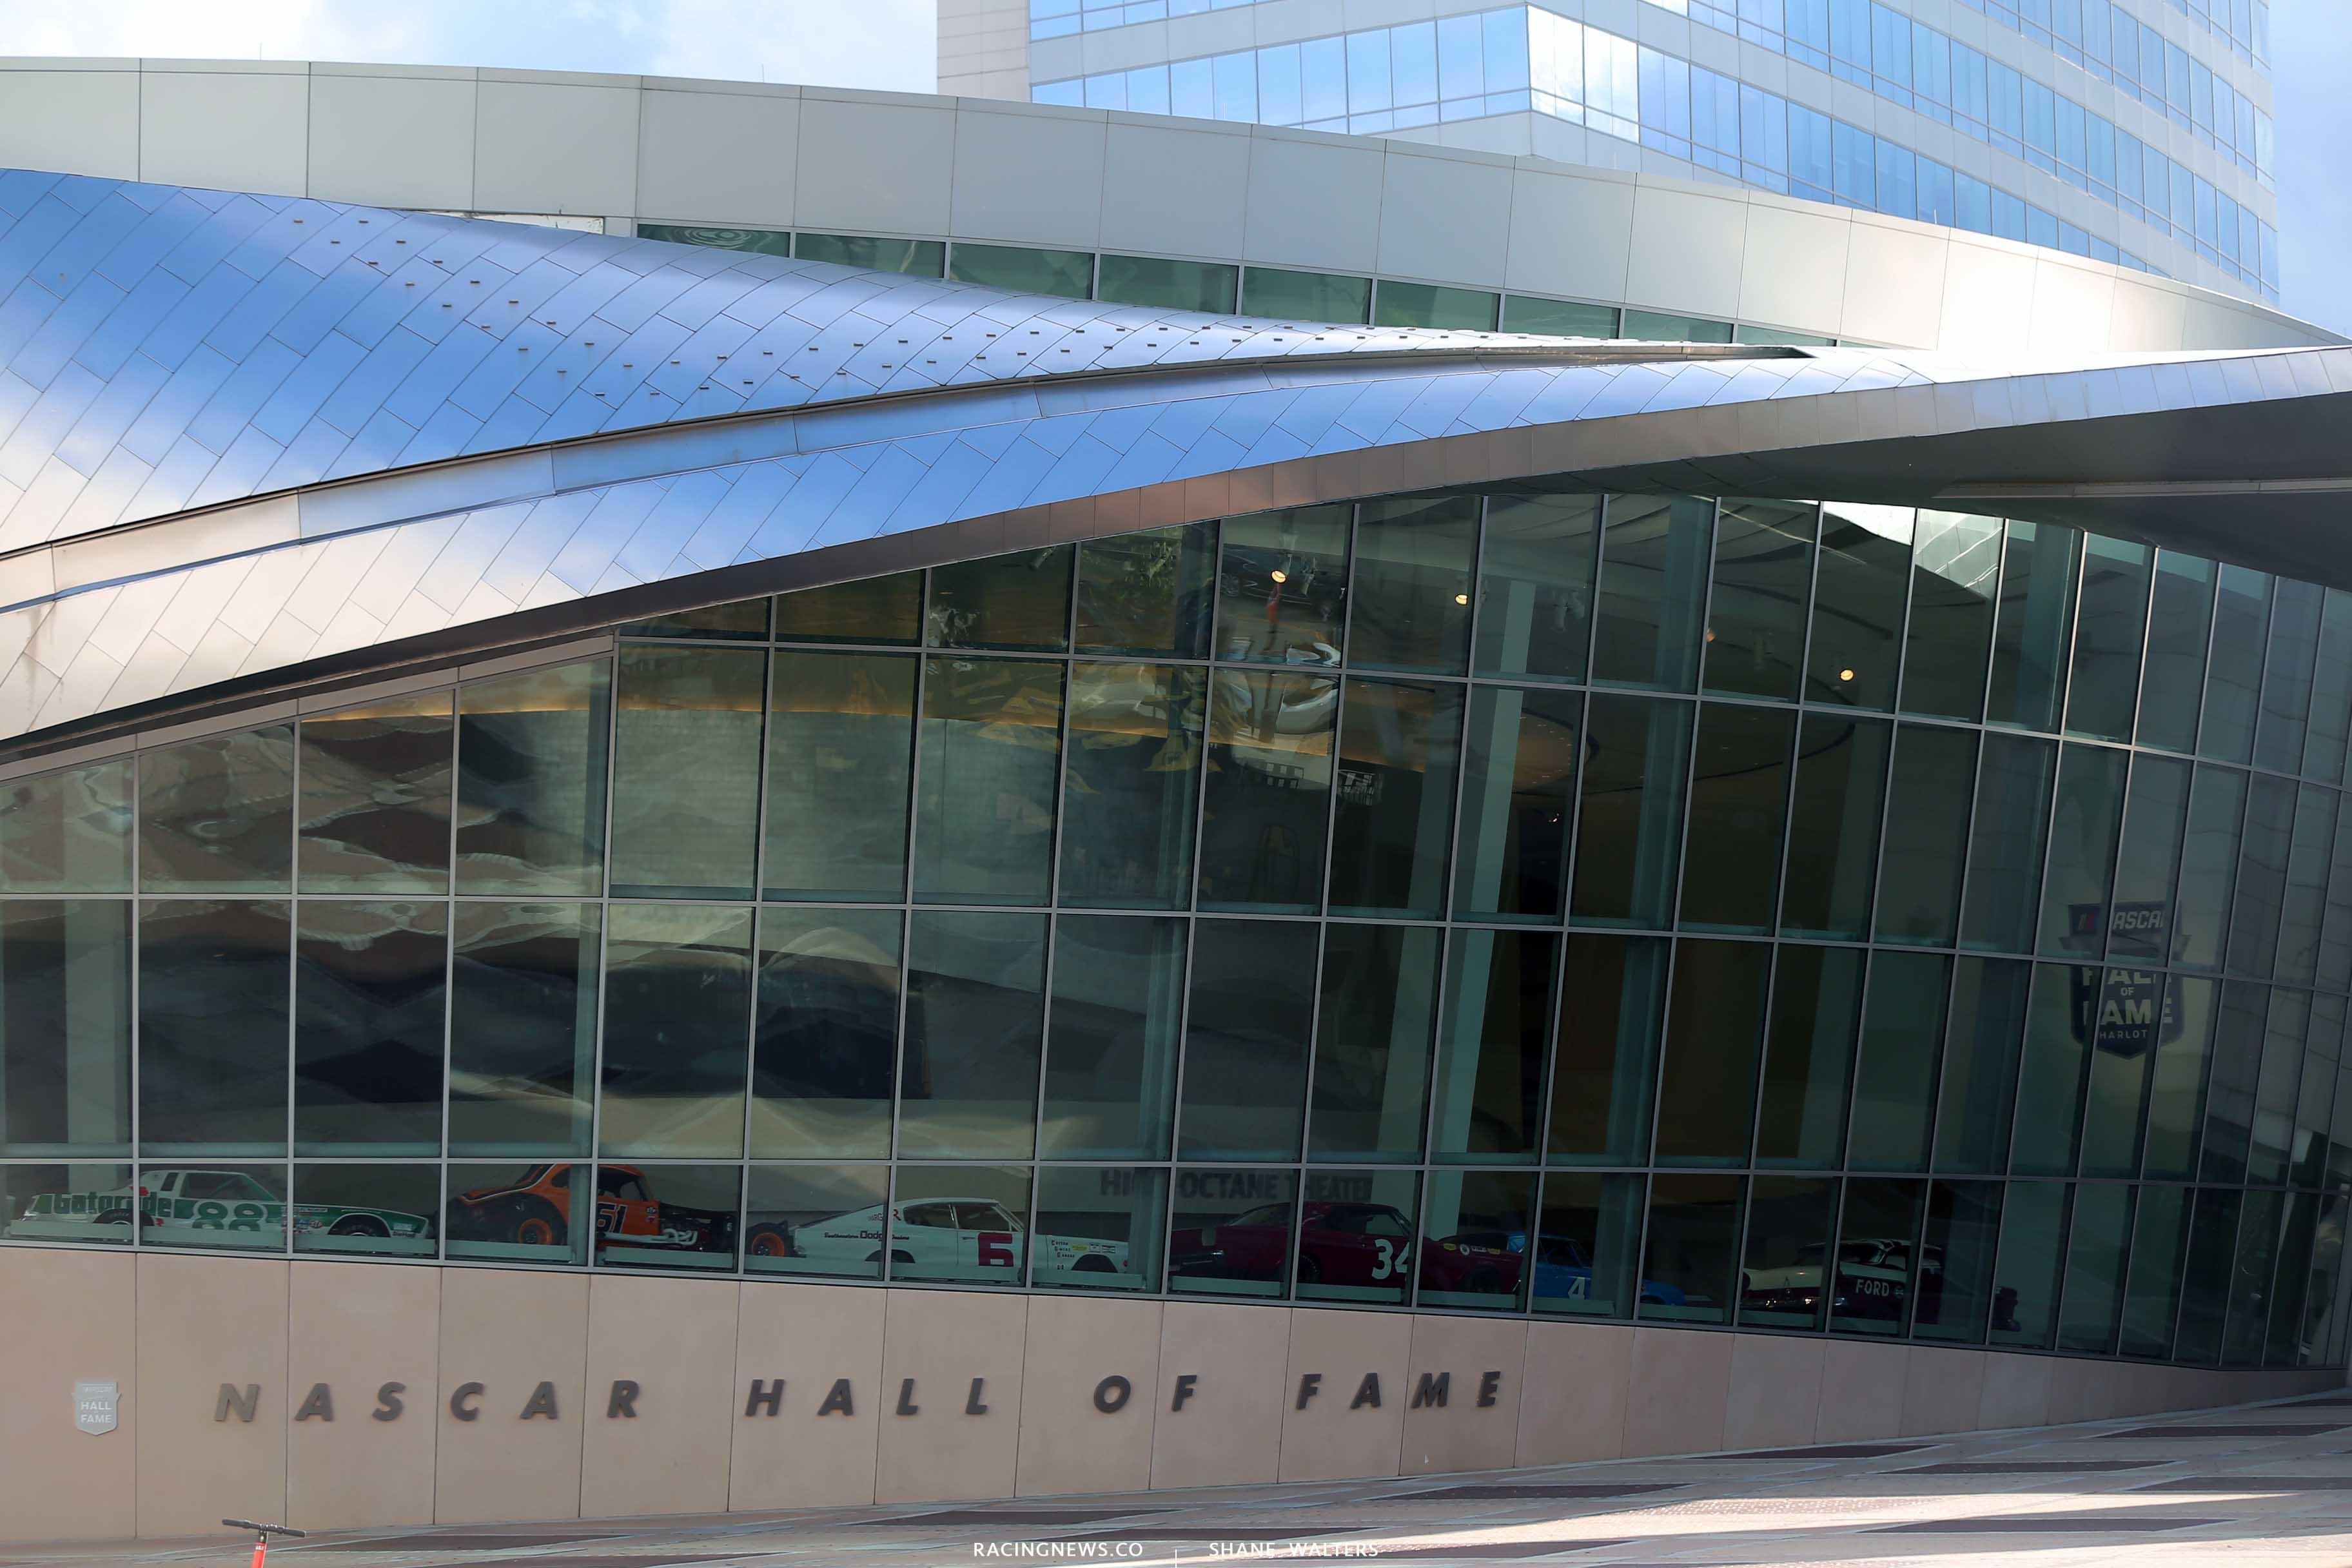 300+ birds strike NASCAR Hall of Fame building in Charlotte (Video)